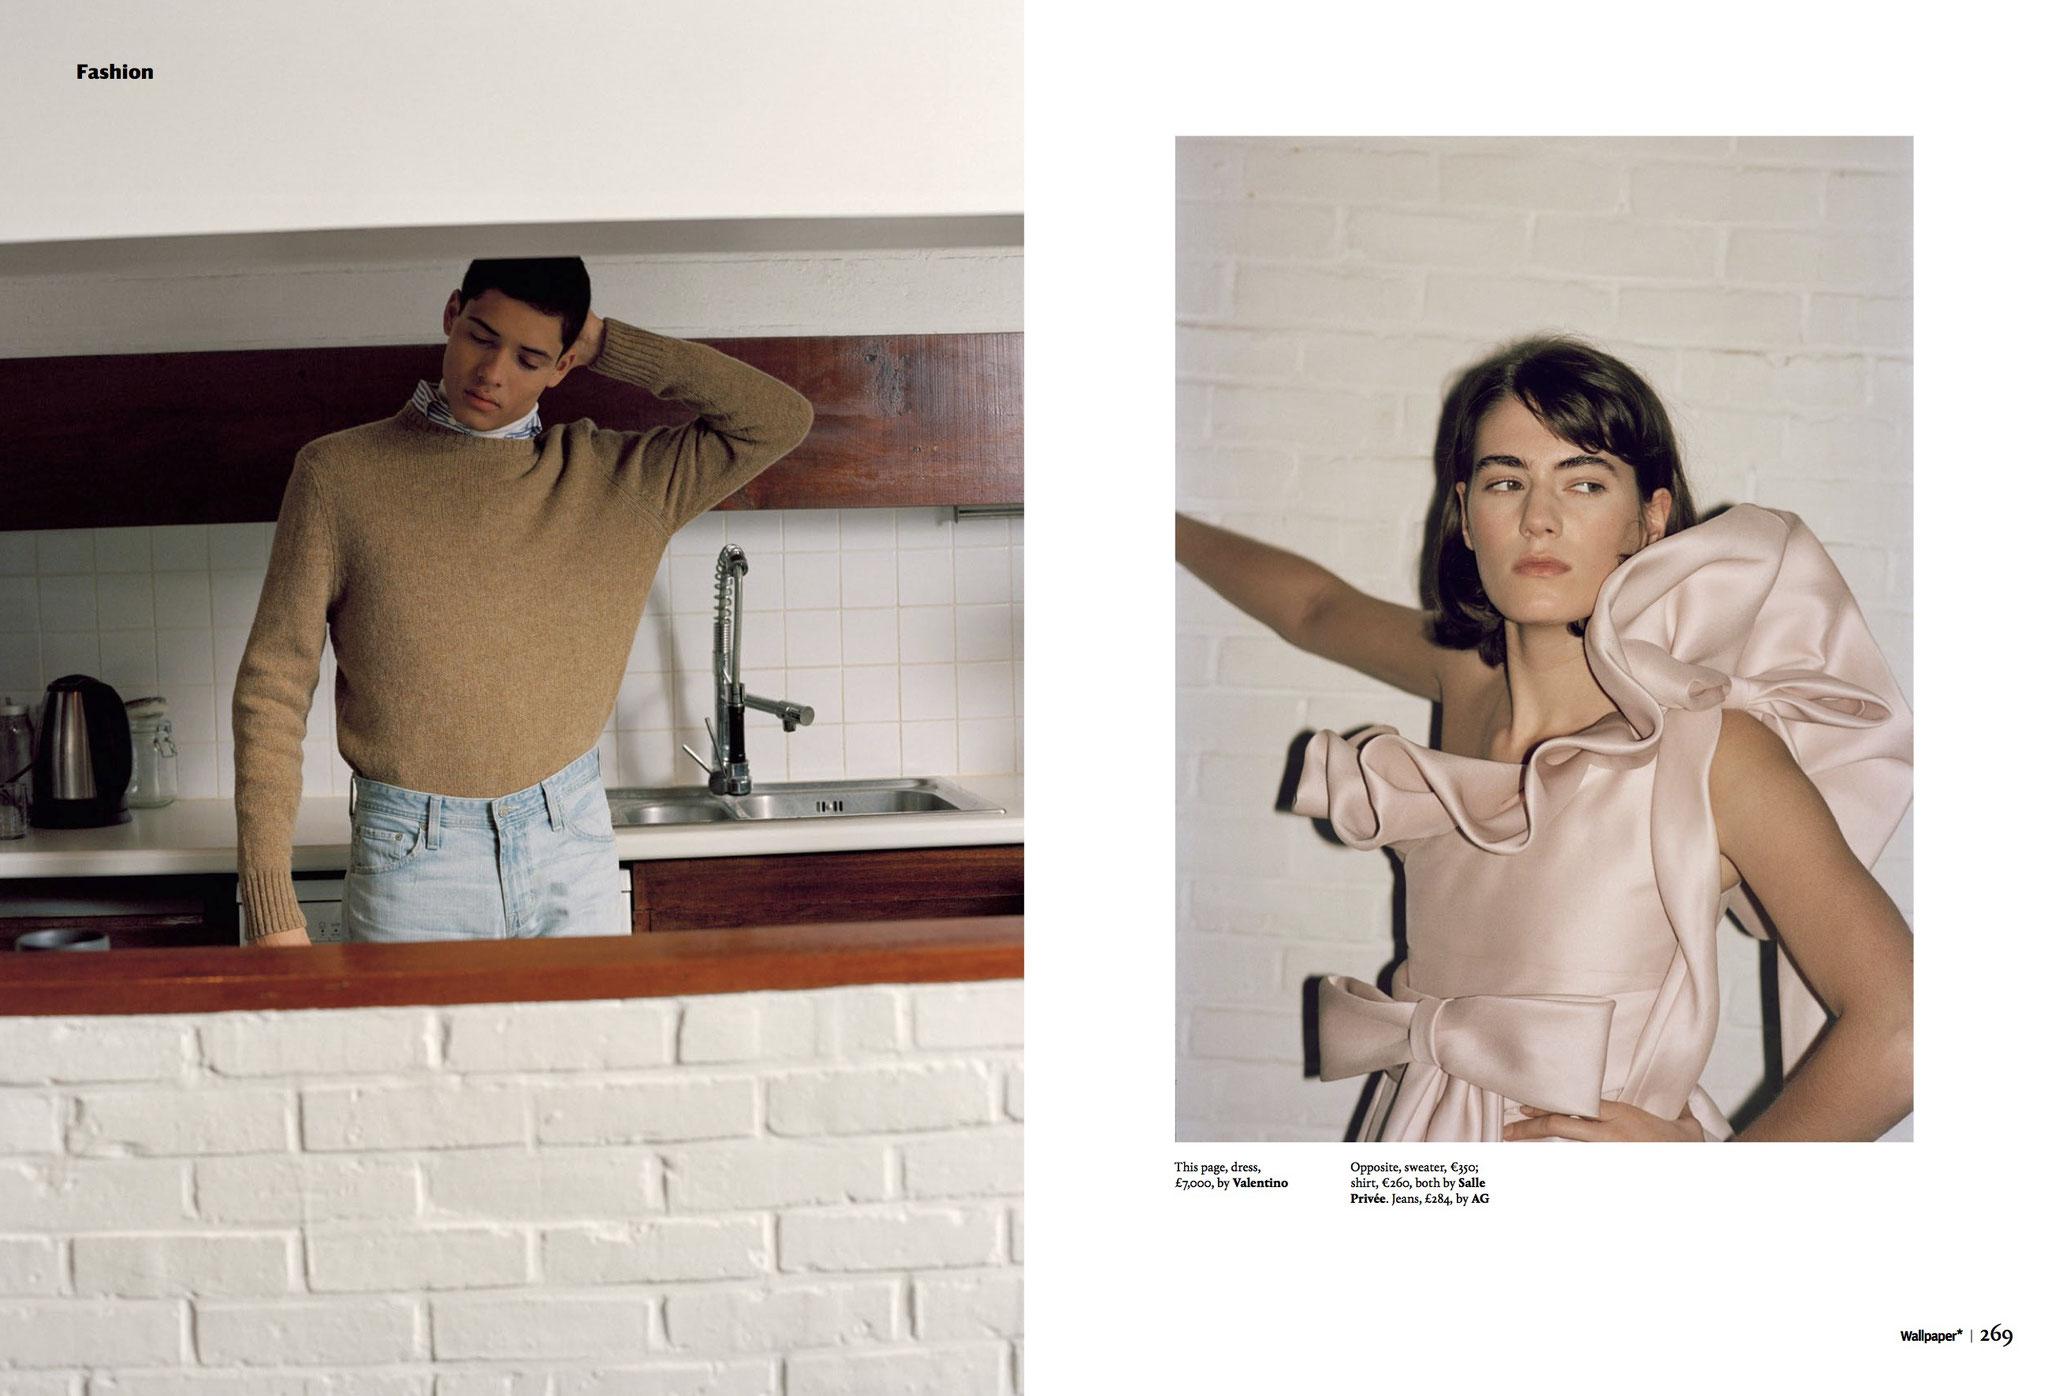 'Wallpaper' ©Esther Theaker Fashion Editor Jerome Andre